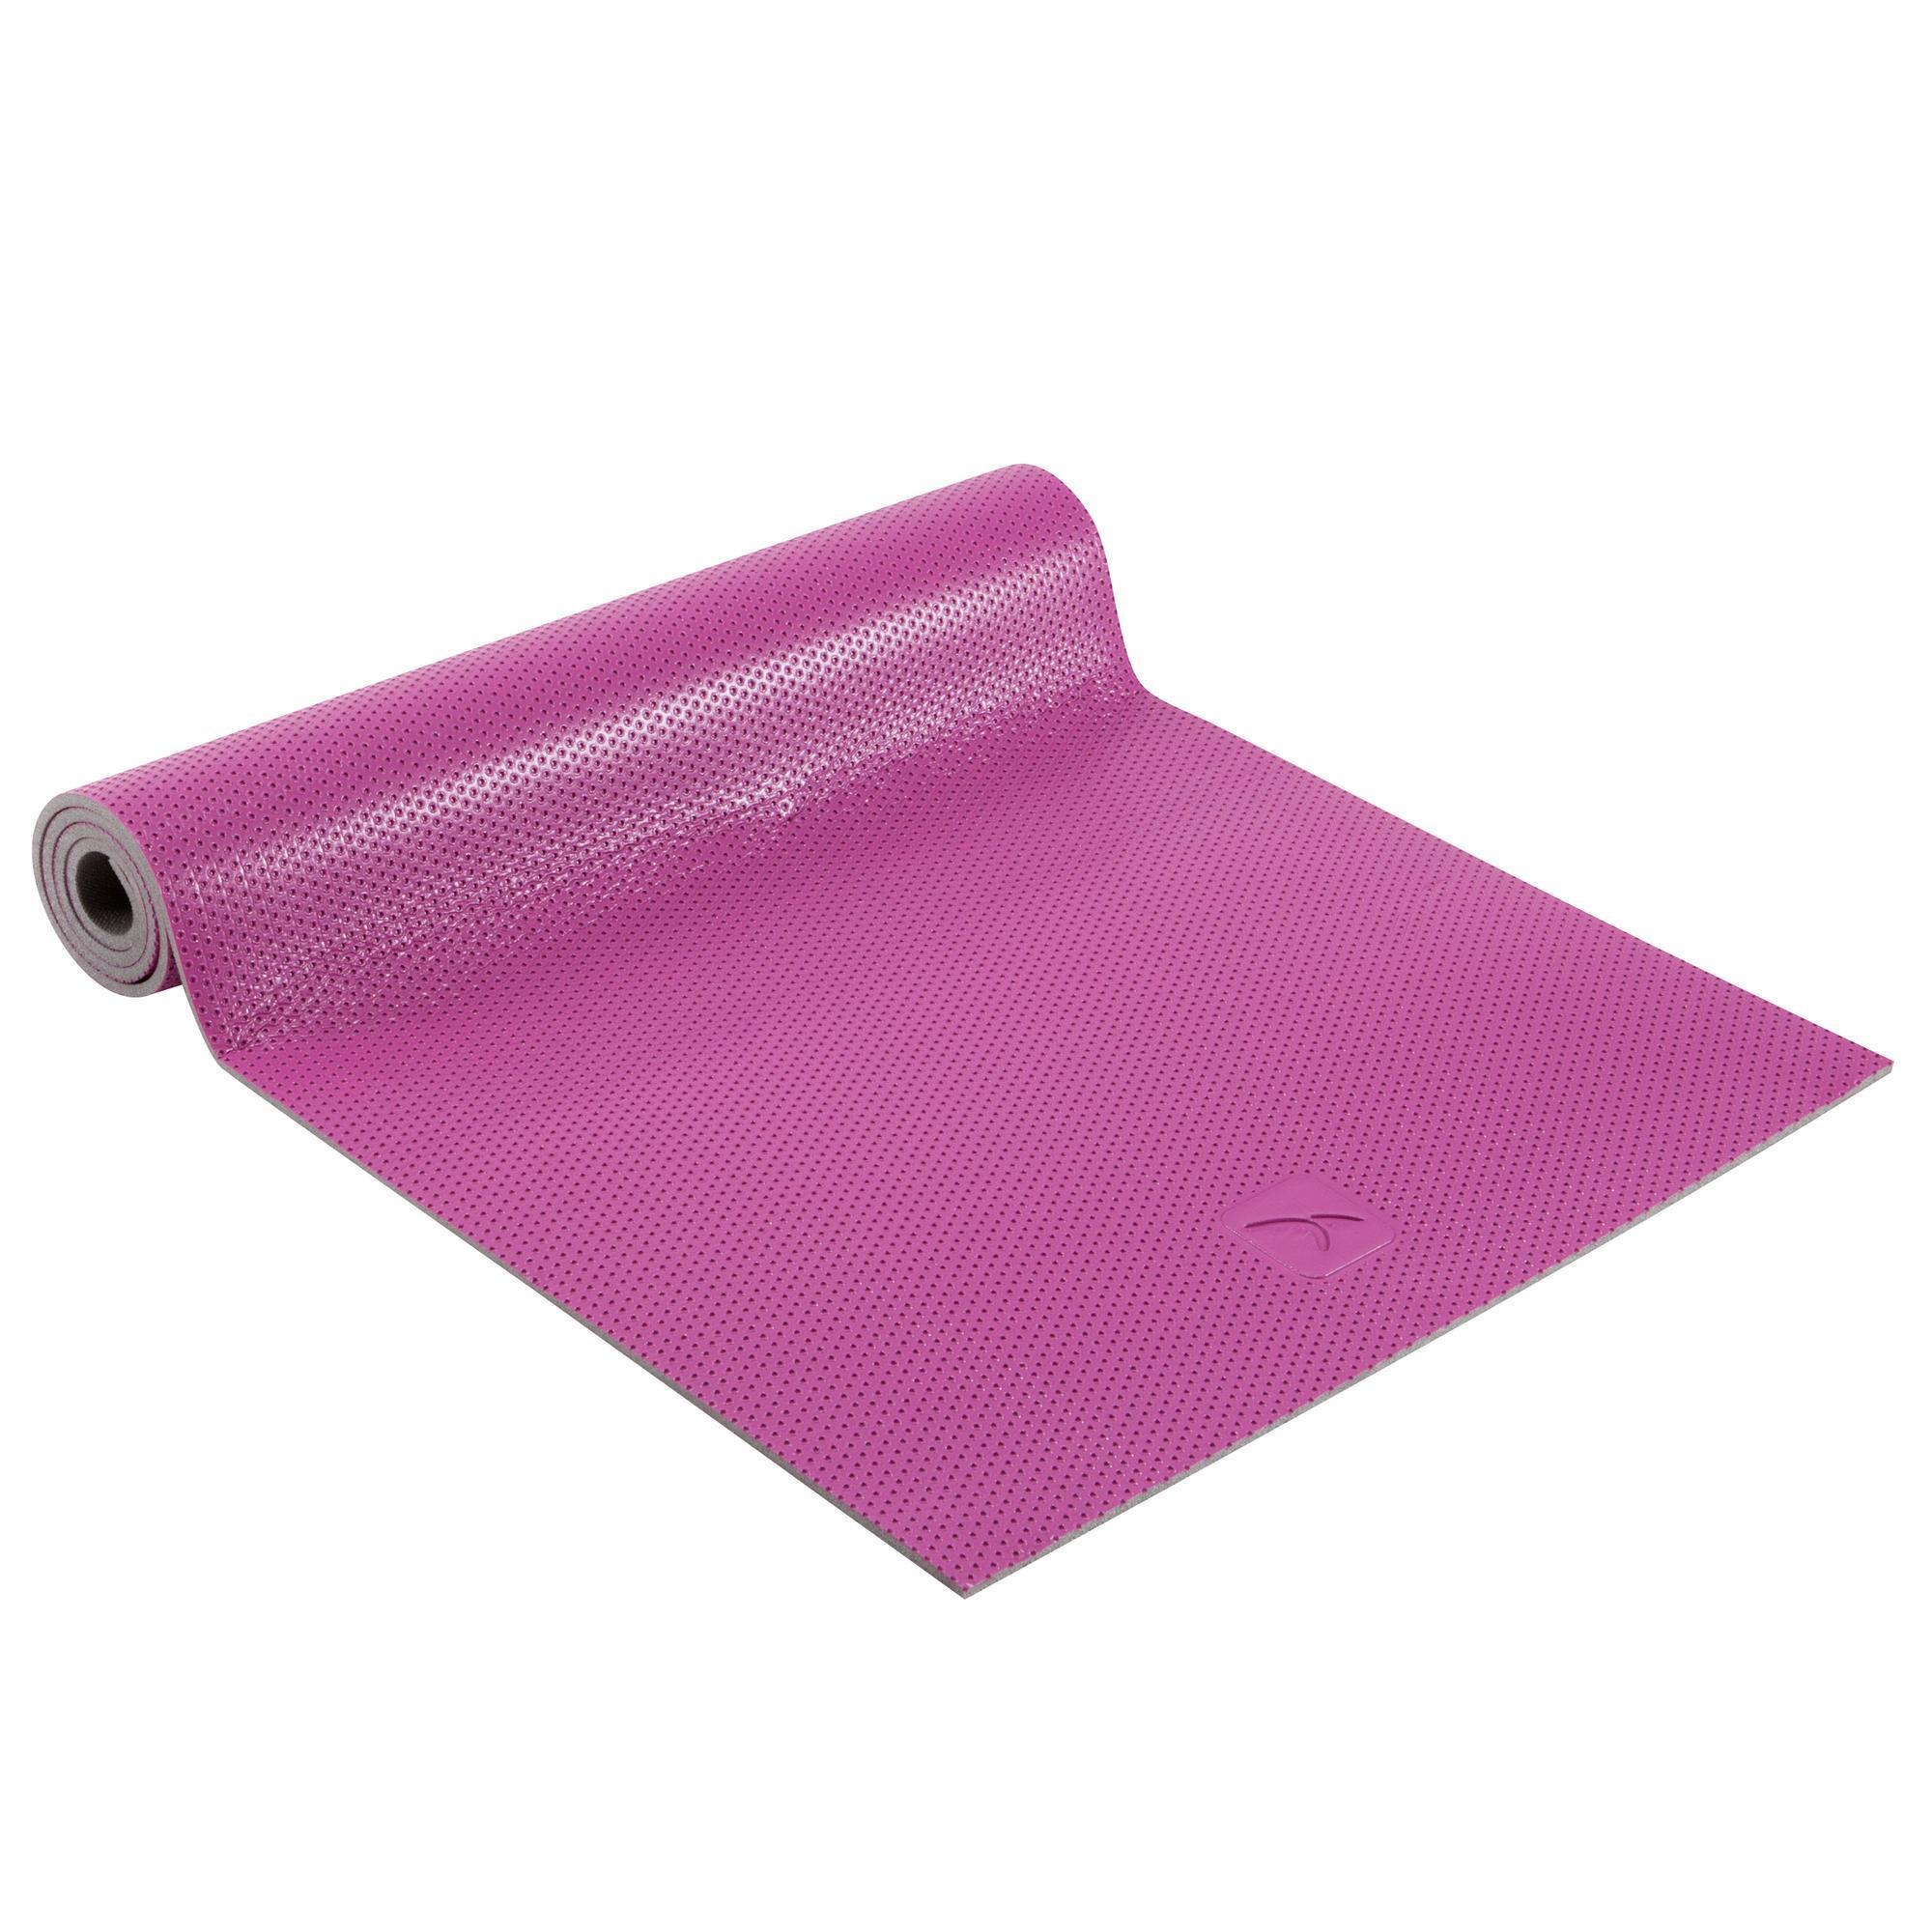 tapis de sol 500 gym stretching rose domyos by decathlon. Black Bedroom Furniture Sets. Home Design Ideas